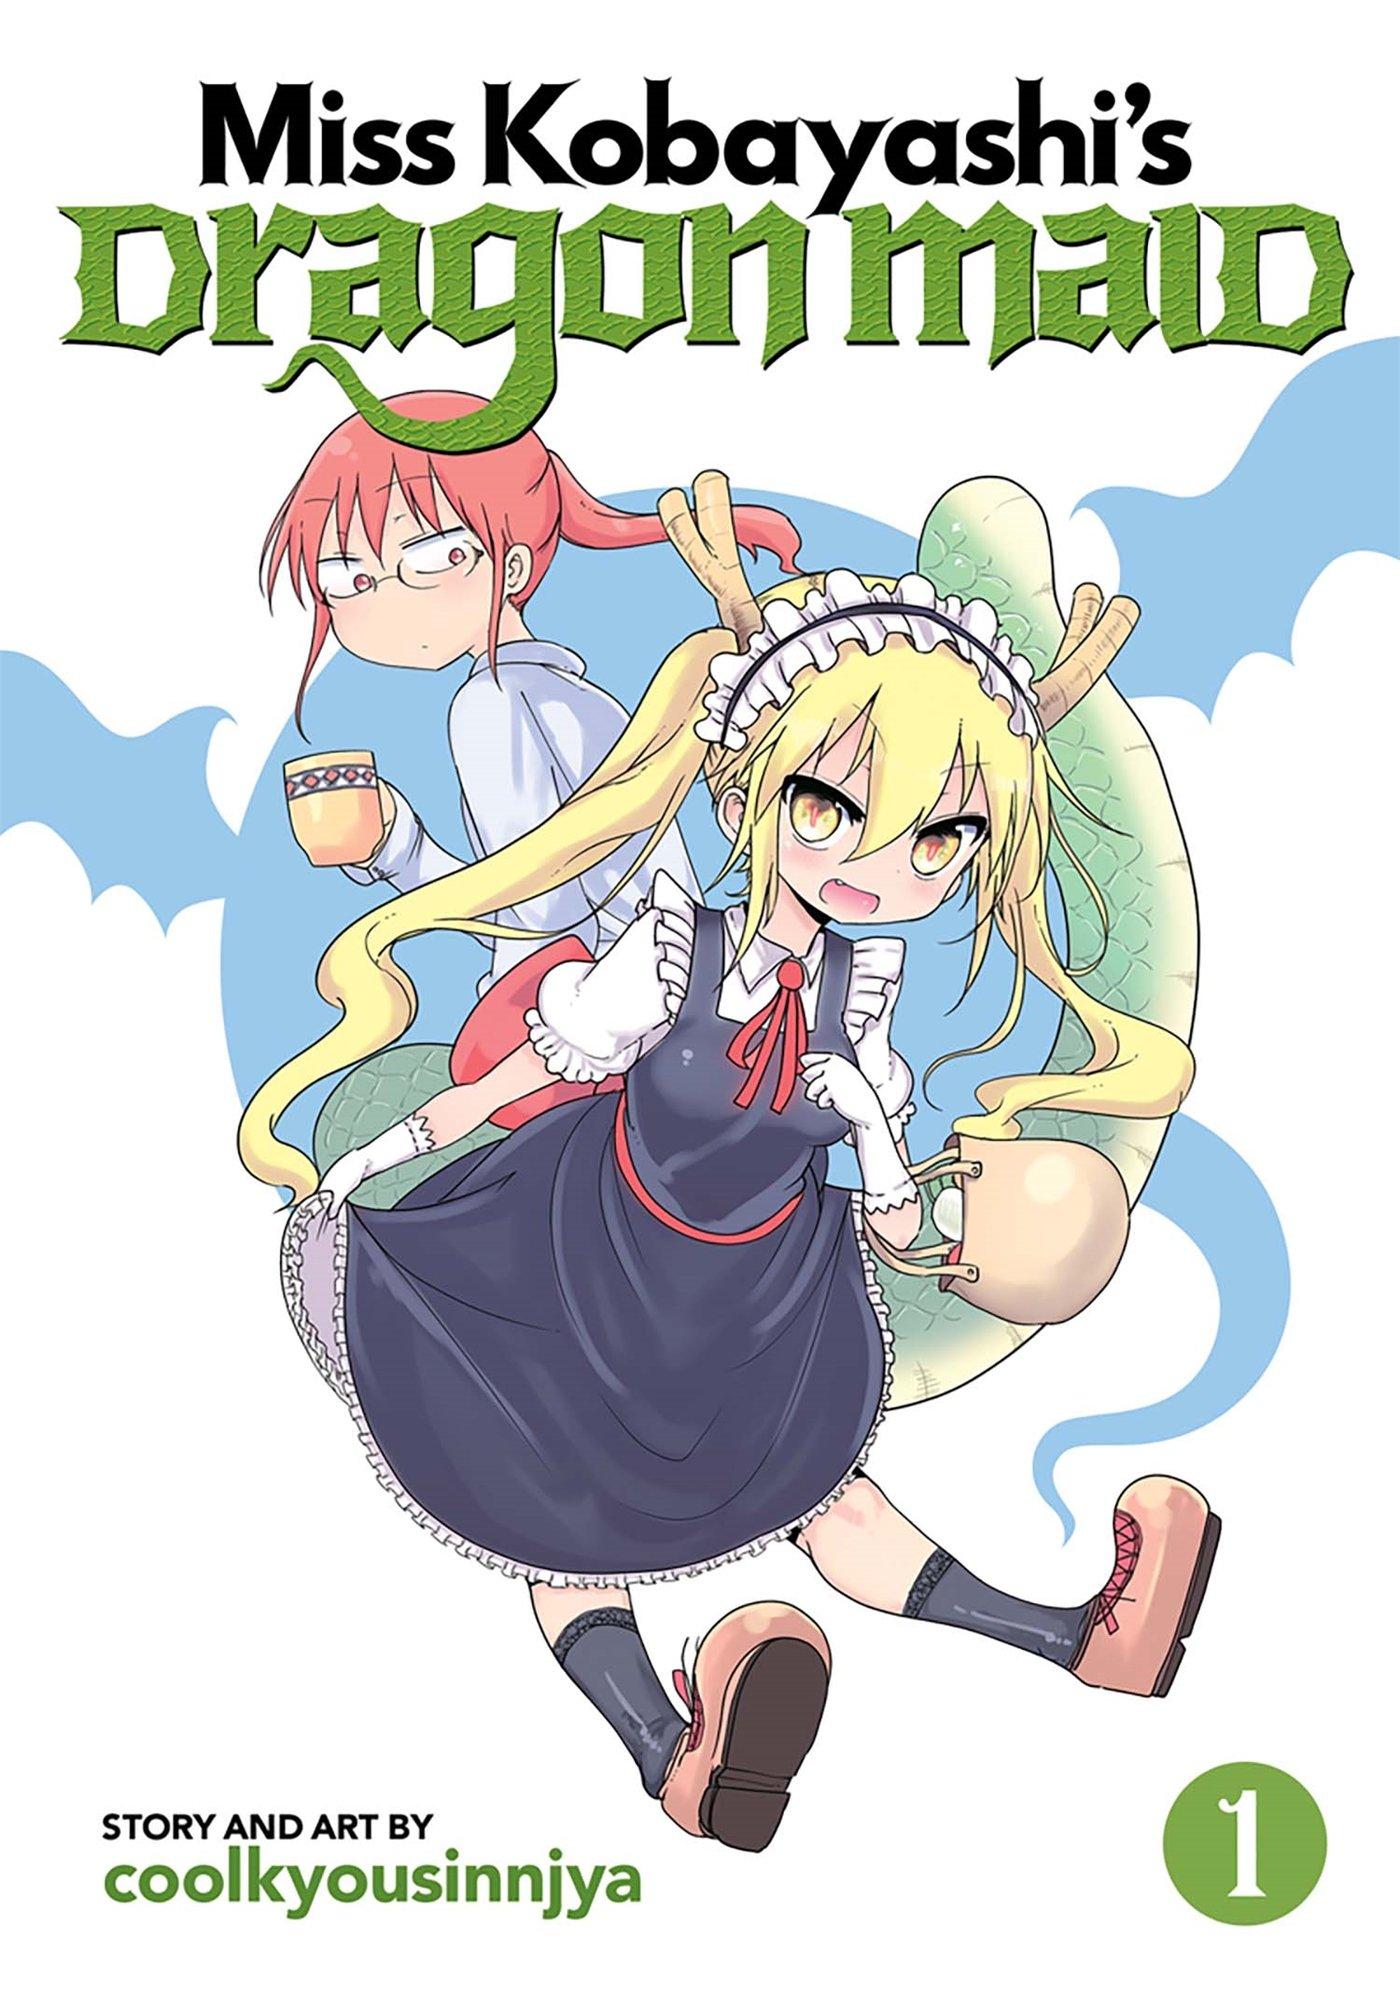 Kobayashi-san Chi no Maid Dragon (Manga)